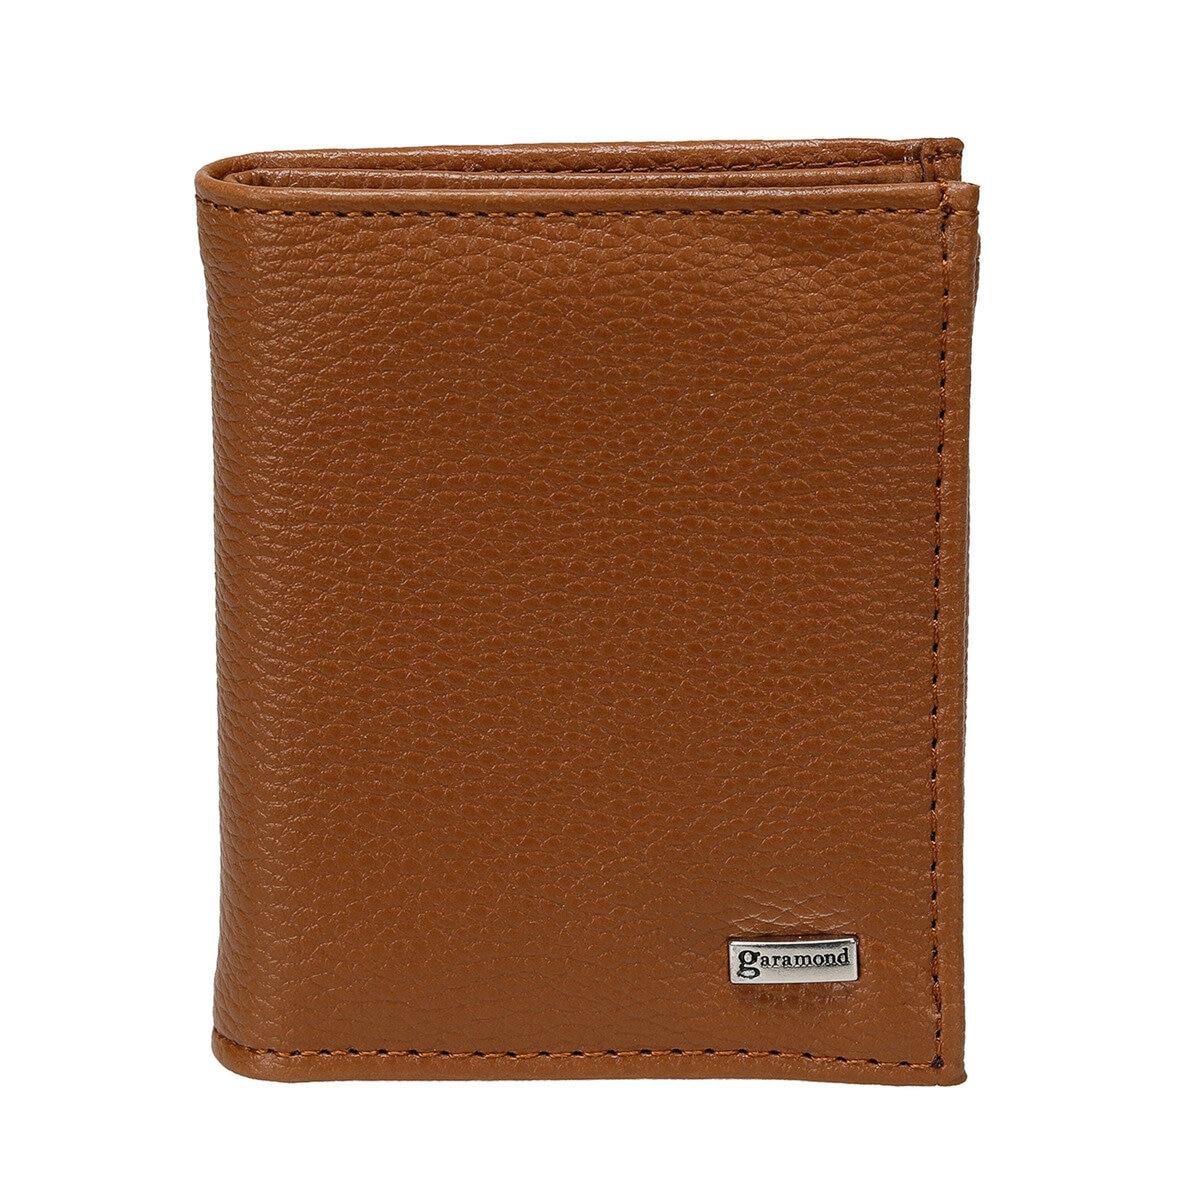 FLO KN DKY CZDN Tan Male Wallet Garamond